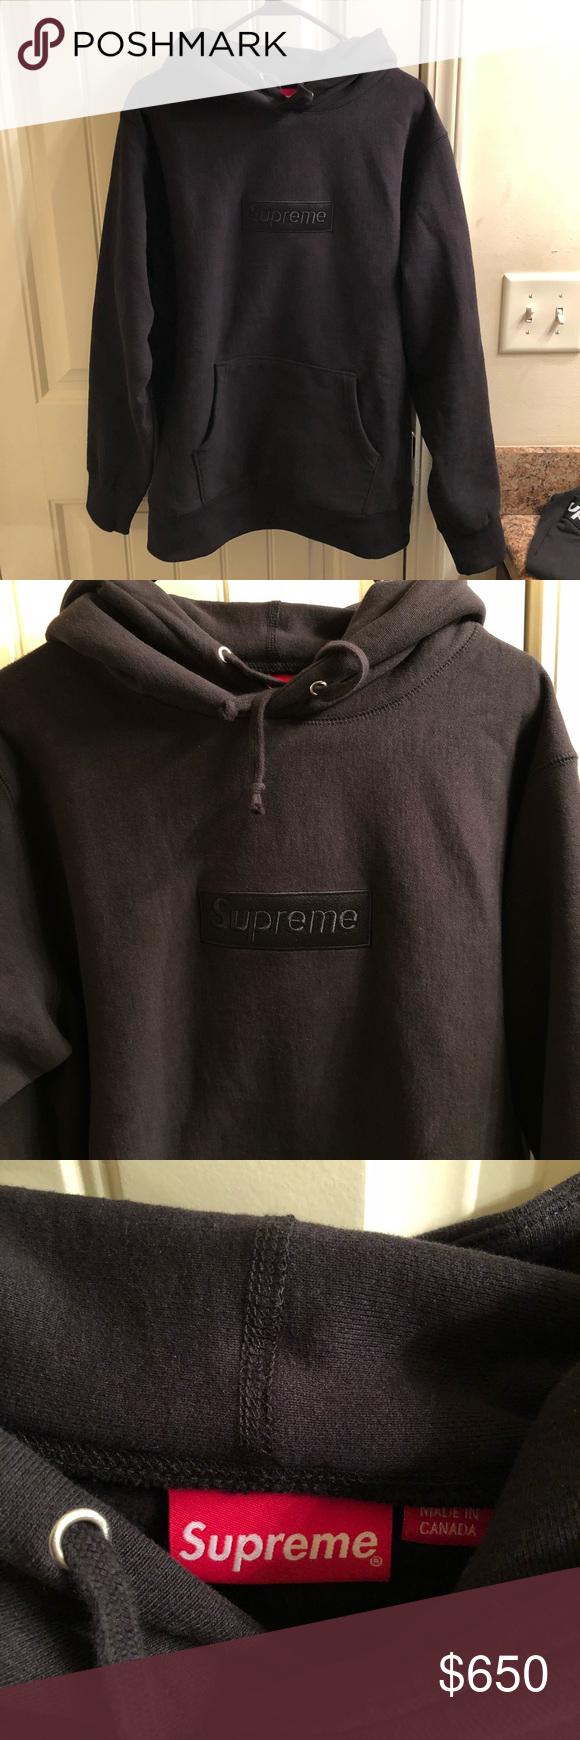 3ce1d061f8d7 Supreme Tonal Black Box Logo Hoodie - Size XL Size XL but will fit a L.  Worn 1x. From F W 14 collection